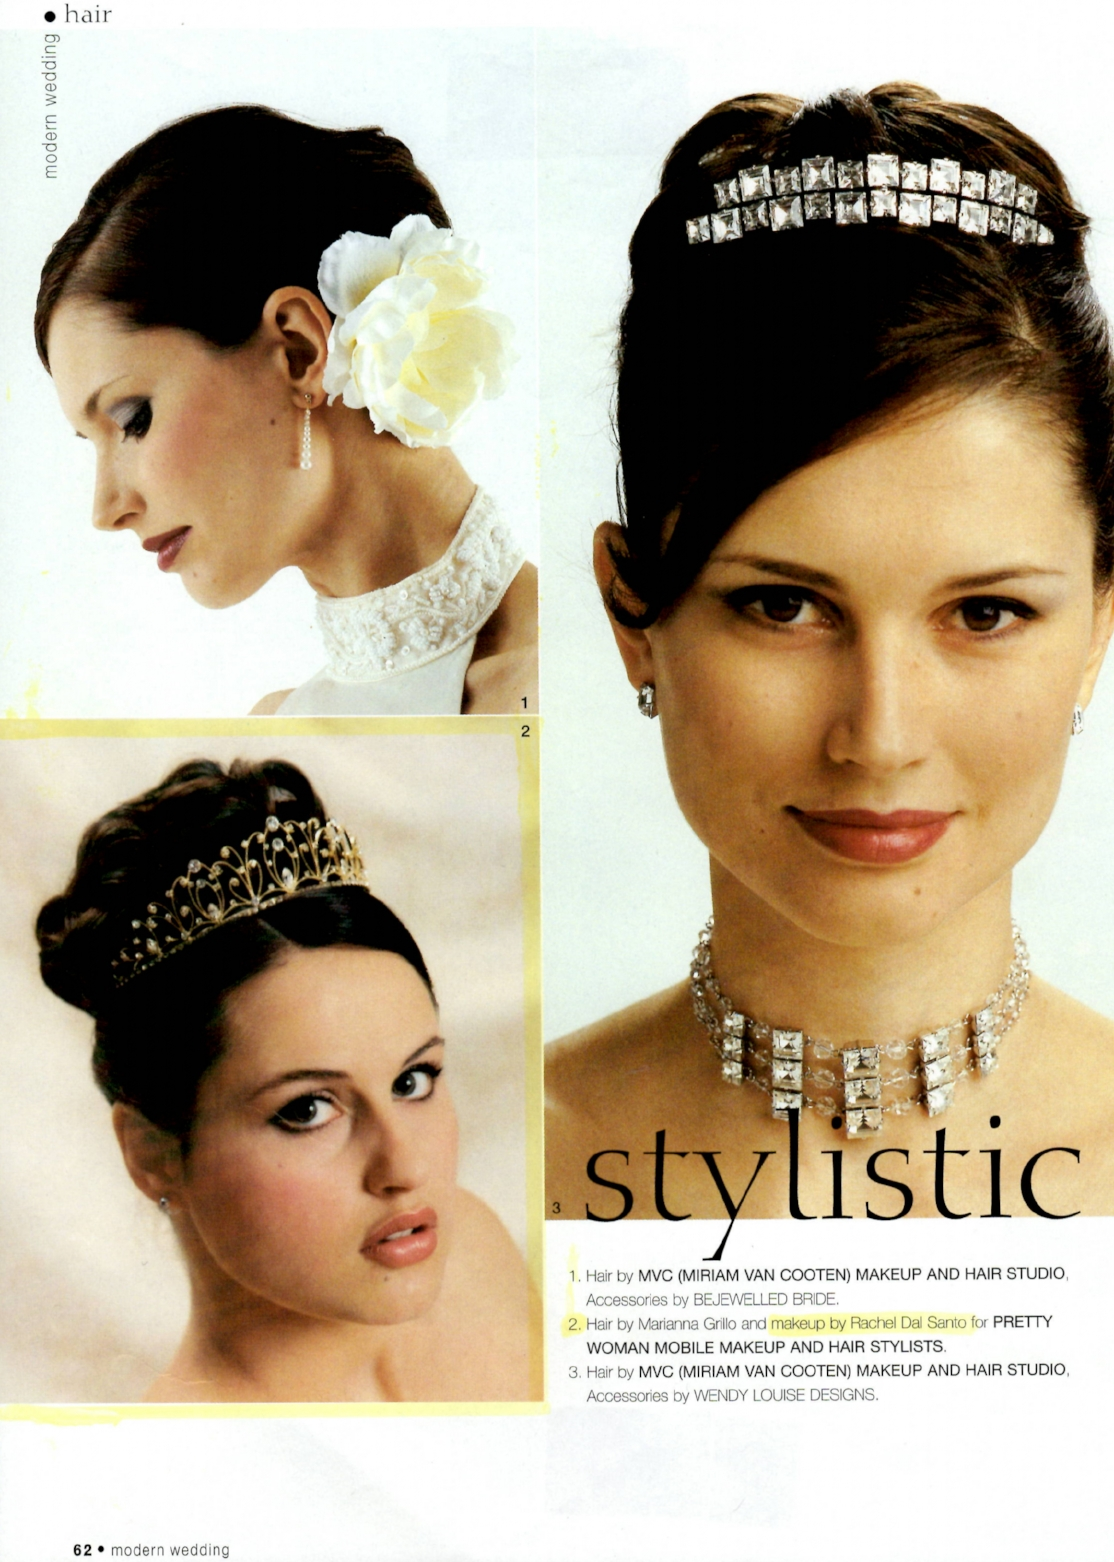 1994 | Modern Wedding Magazine advertisment. Bottom left model features MU by Rachel